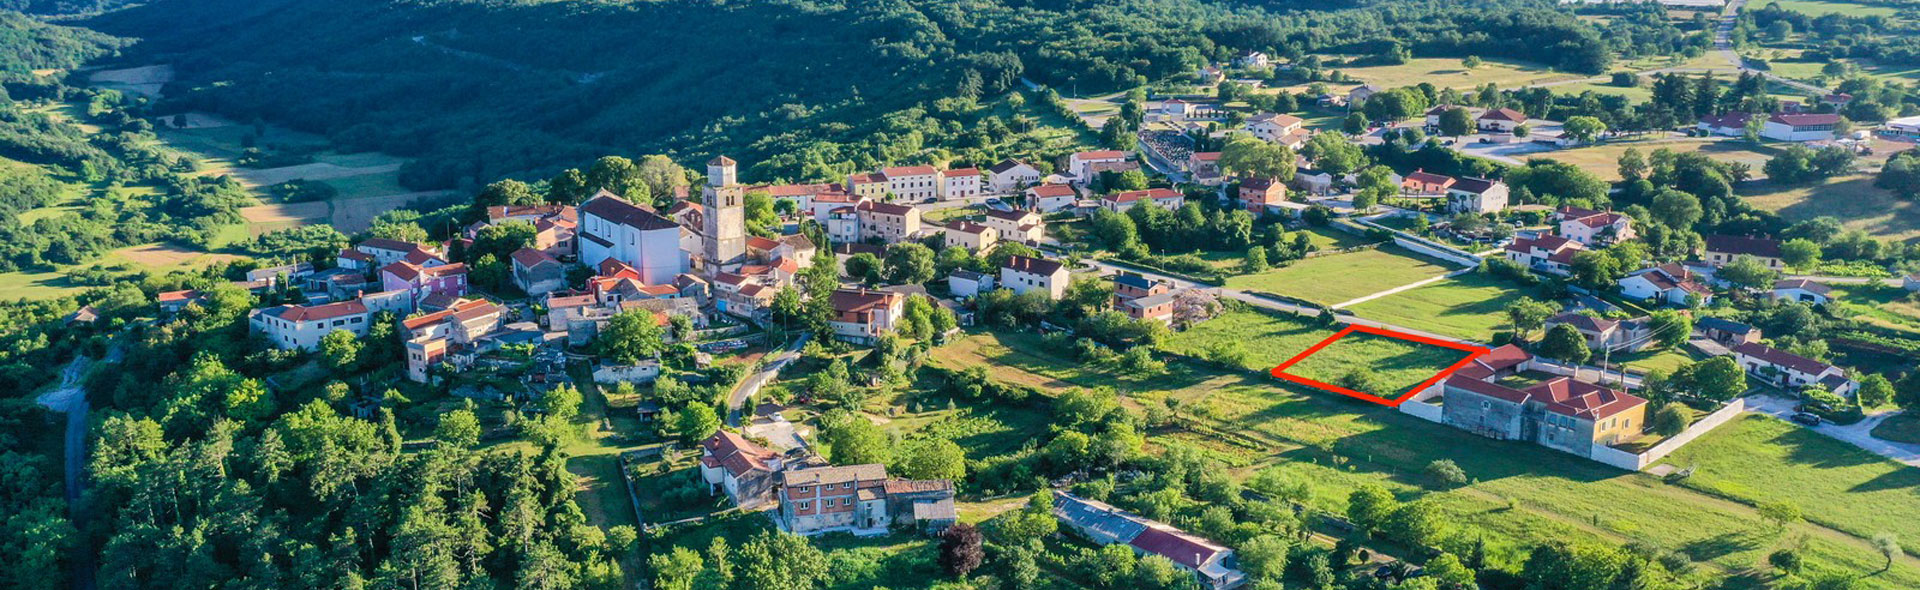 Ville di pietra in Istria